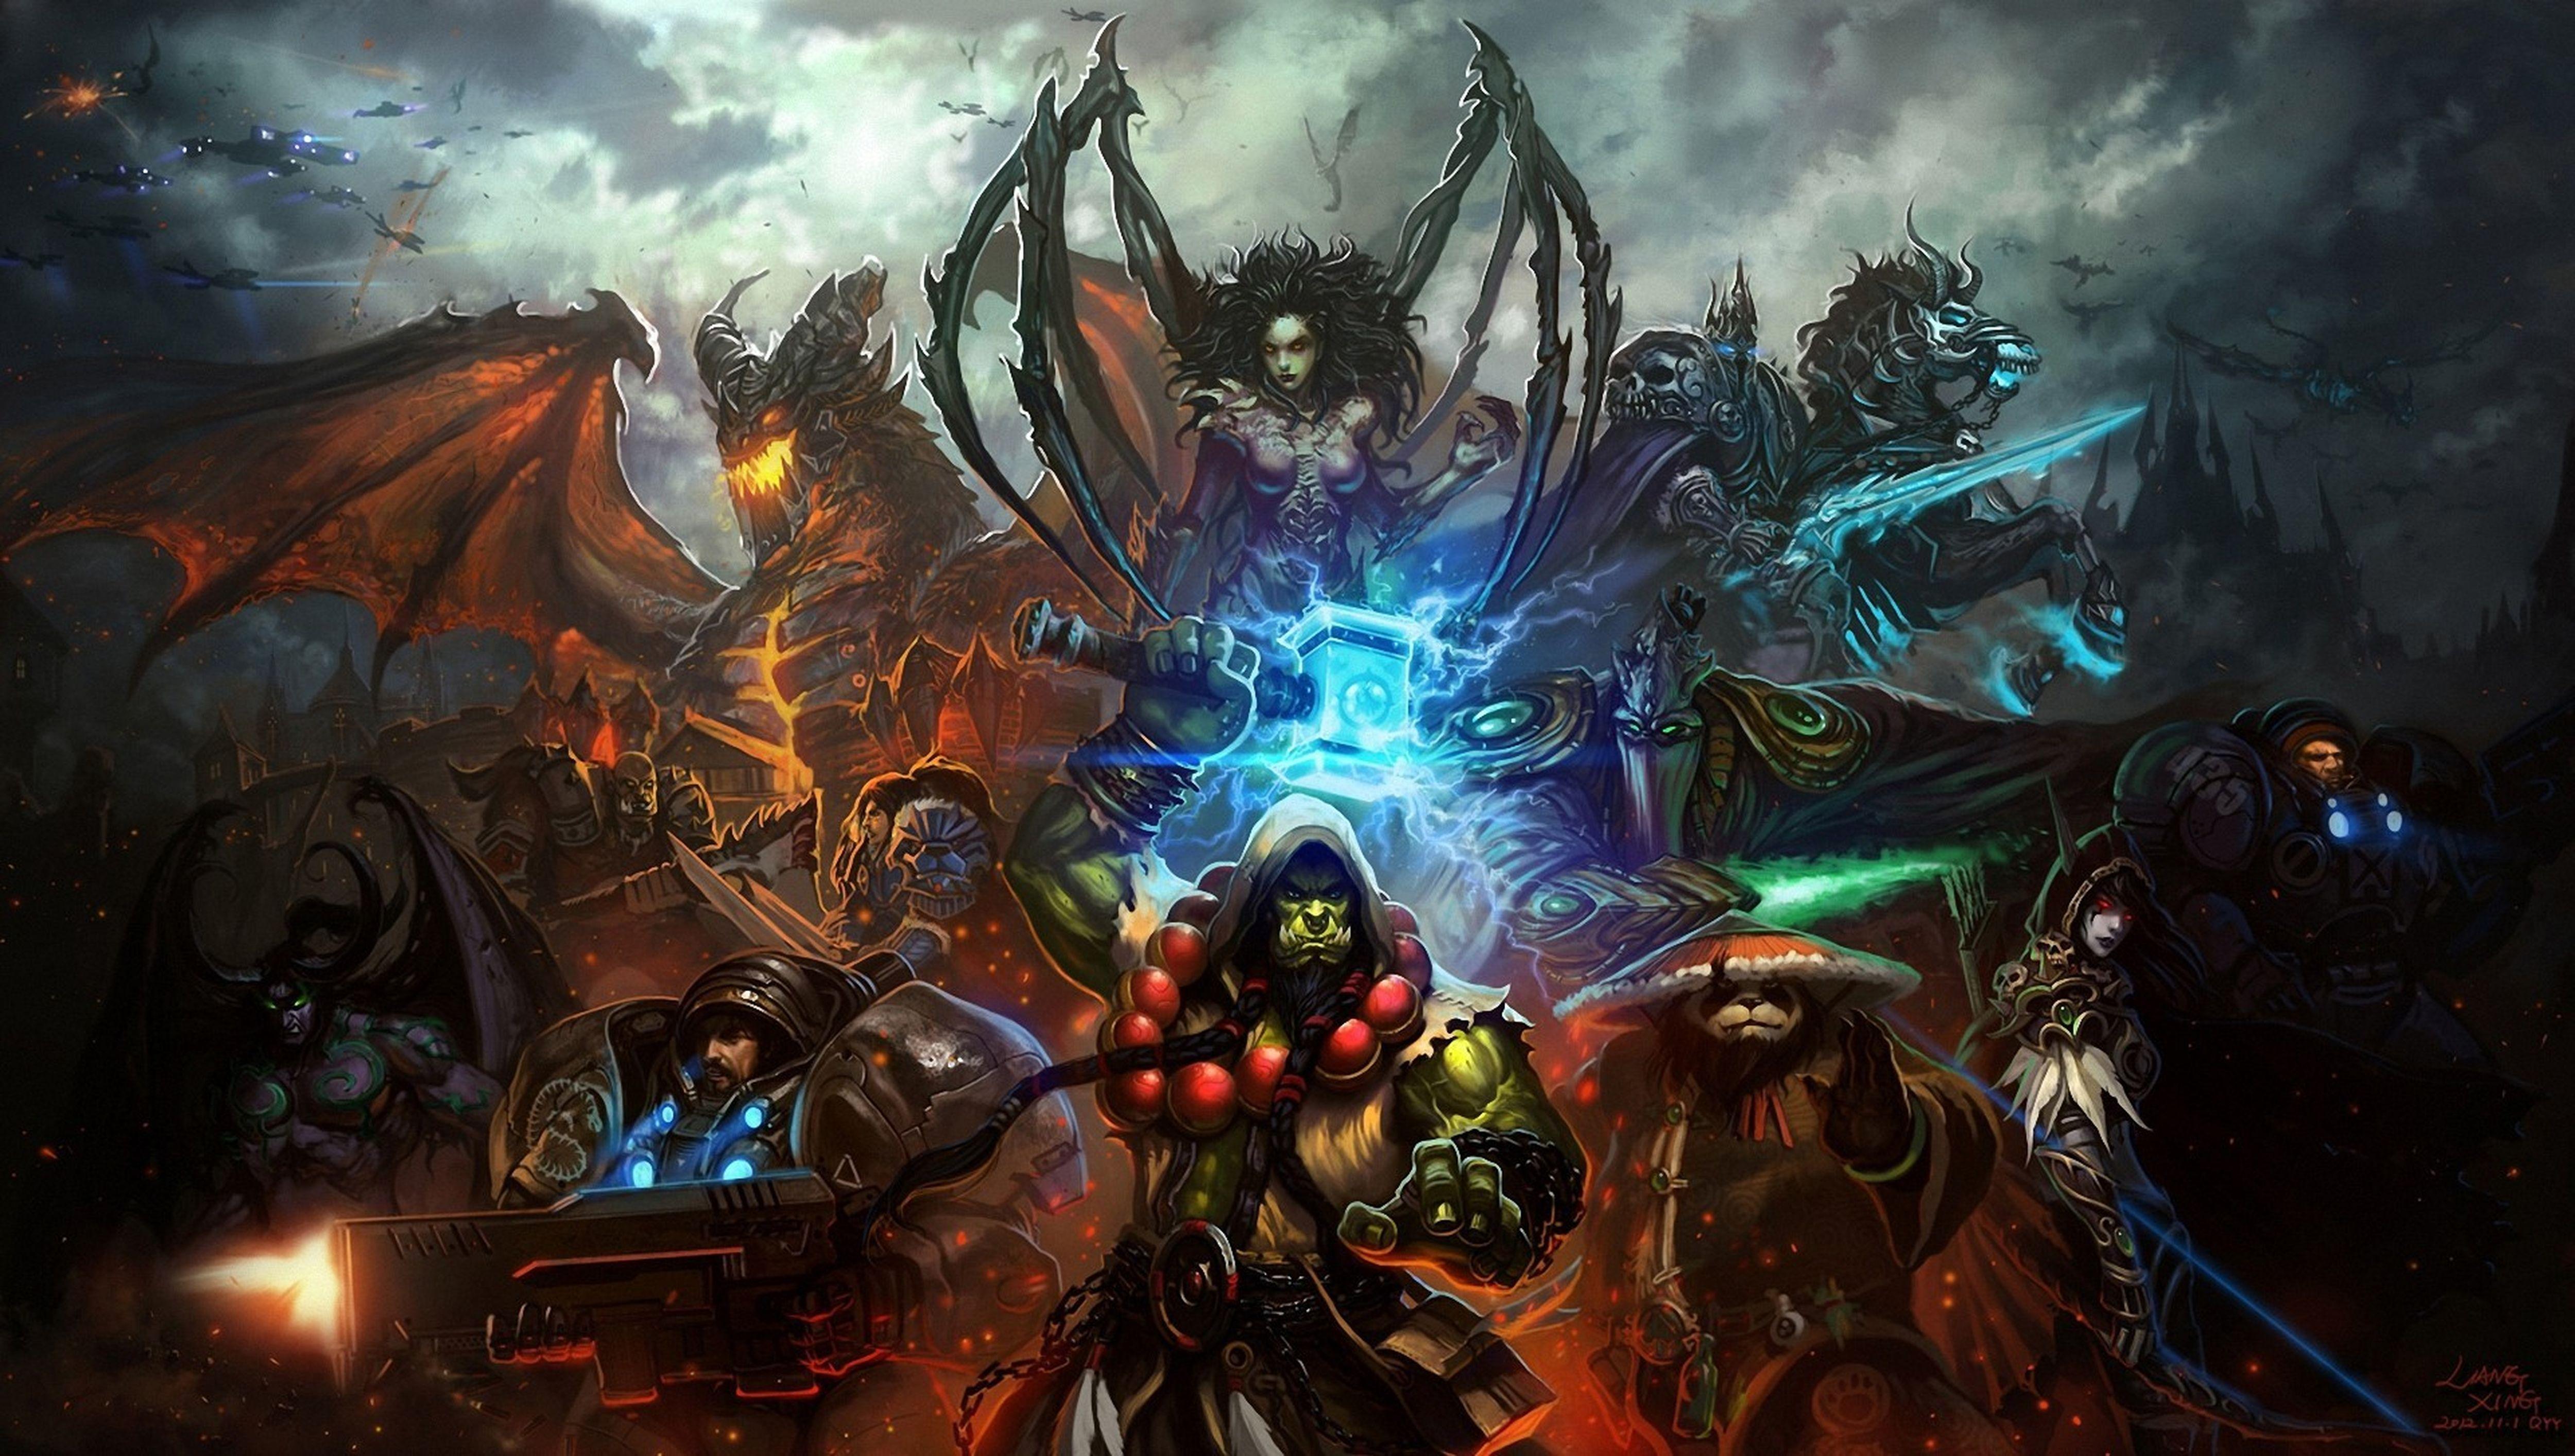 Free Download World Of Warcraft Jeux Video Fond Ecran